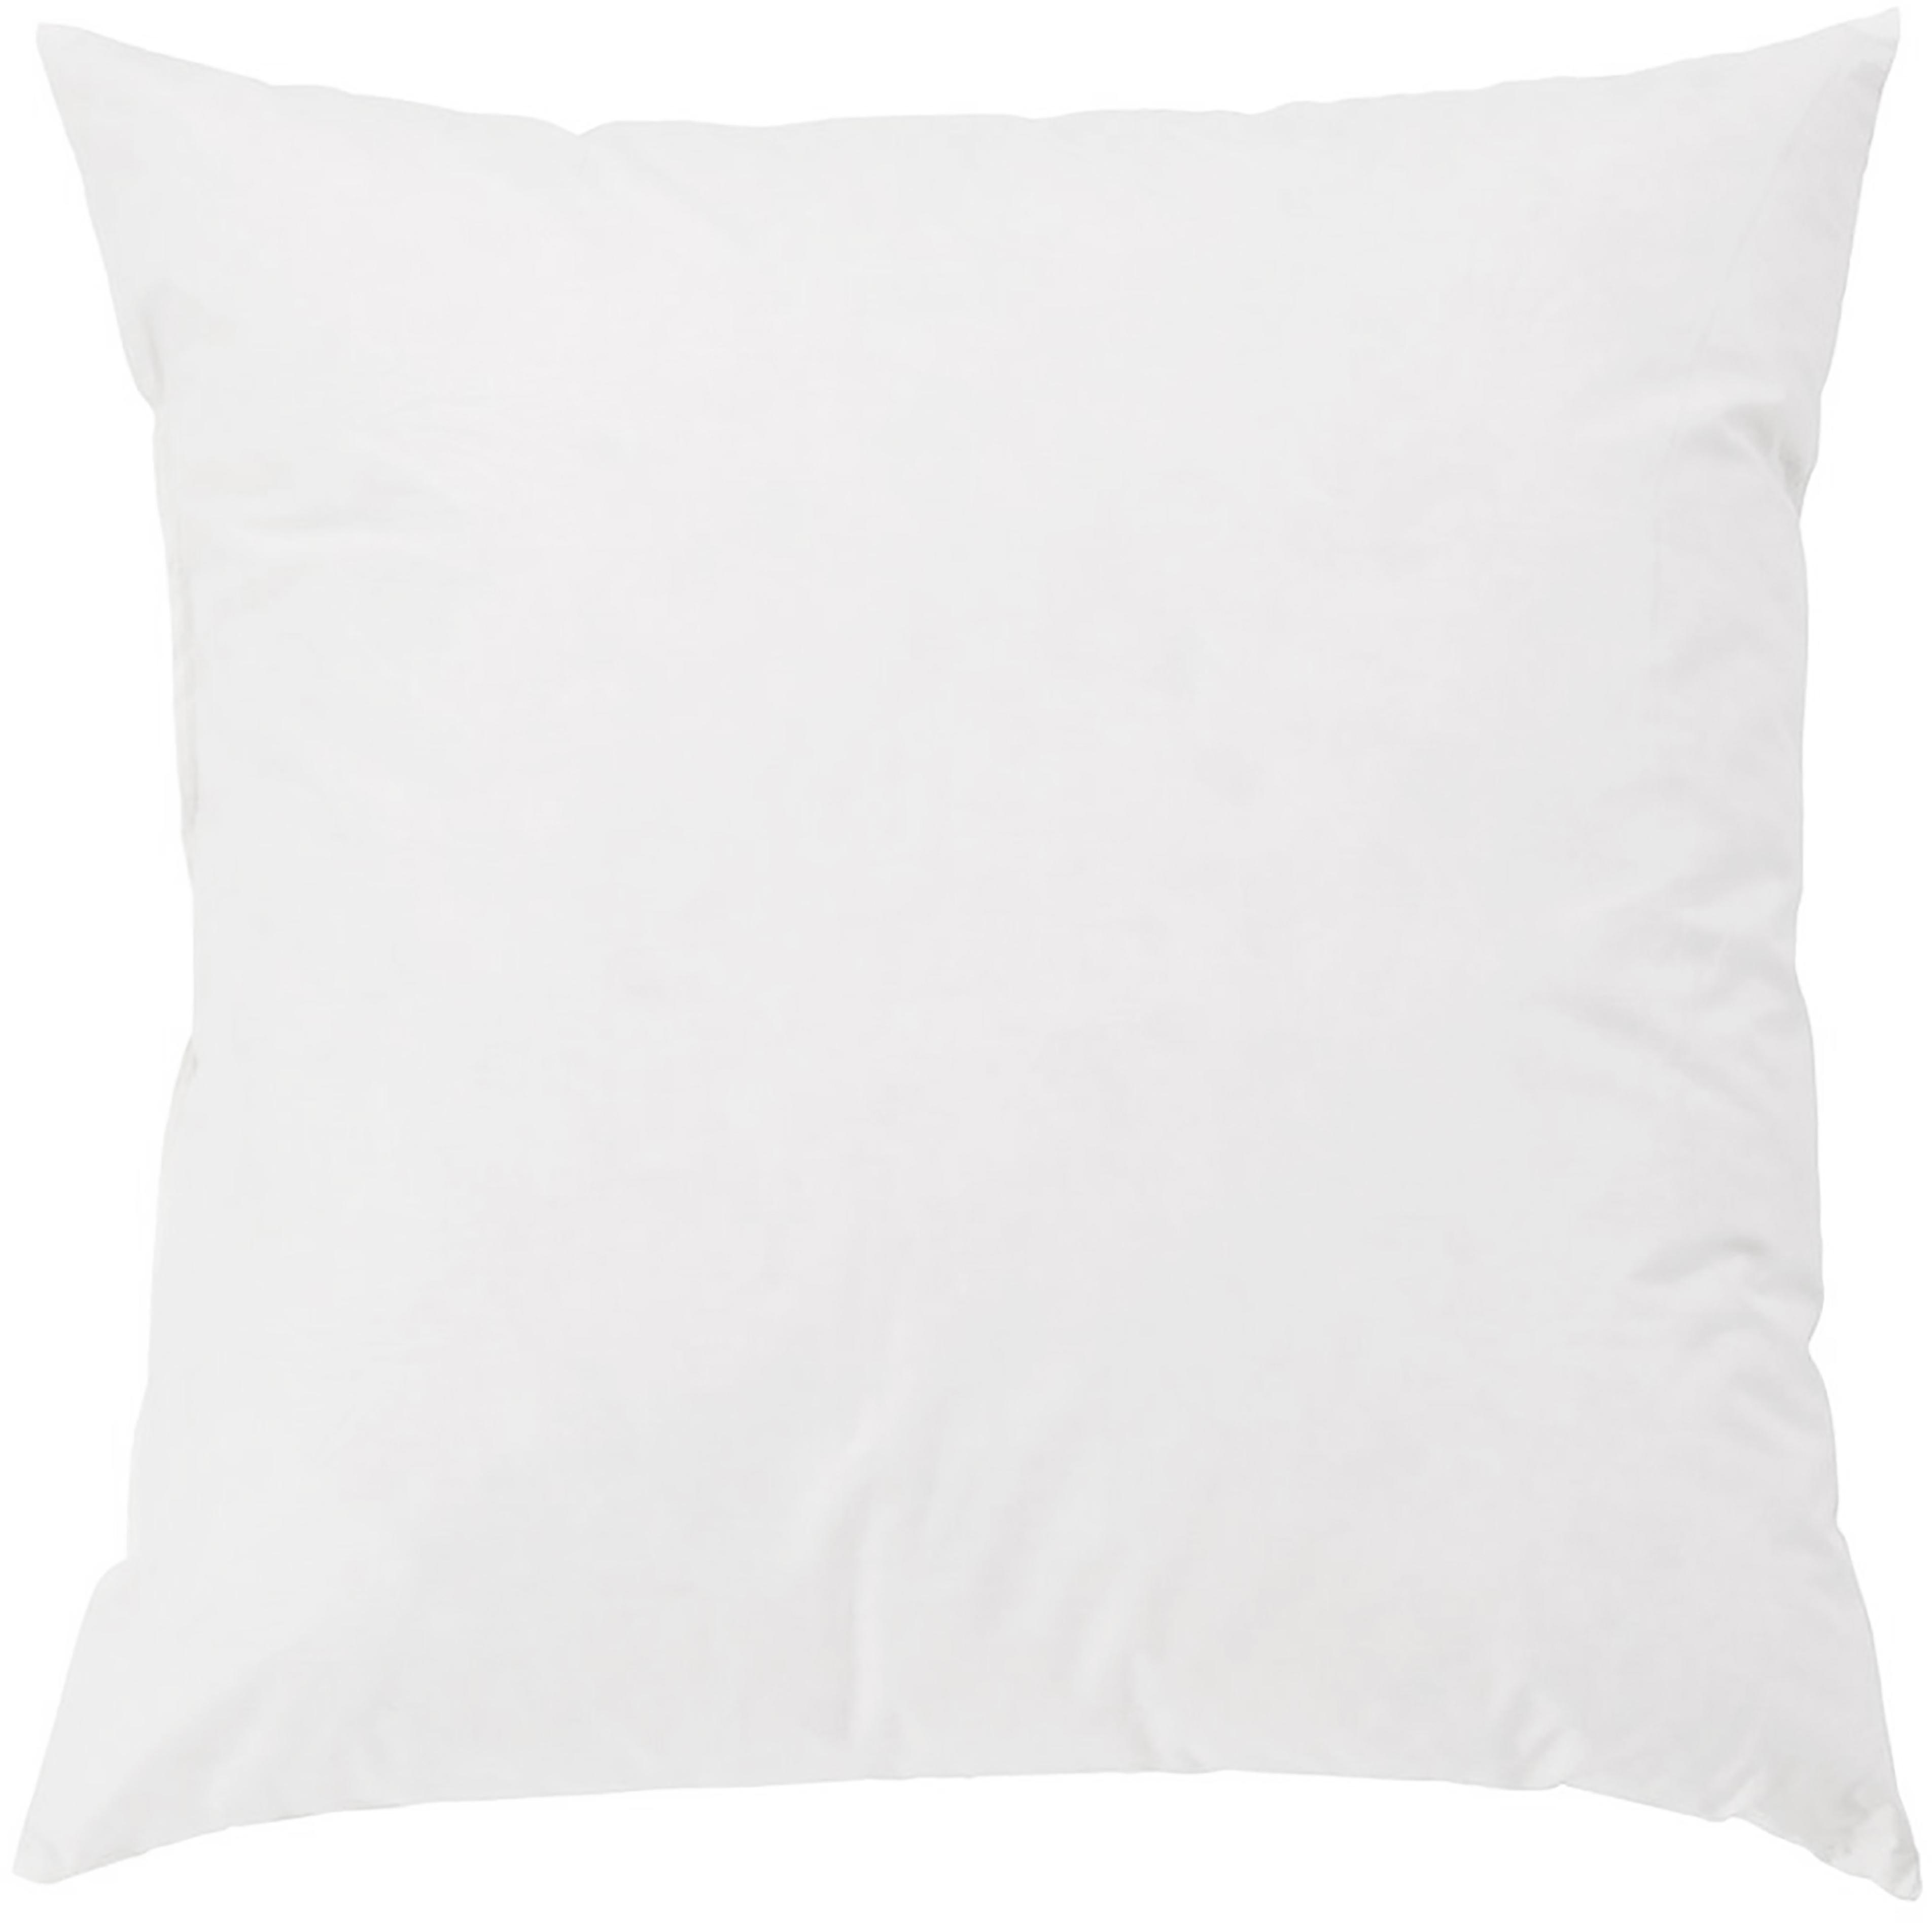 Relleno de cojín Premium, 40x40, Funda: percal Mako, 100%algodón, Blanco, An 40 x L 40 cm